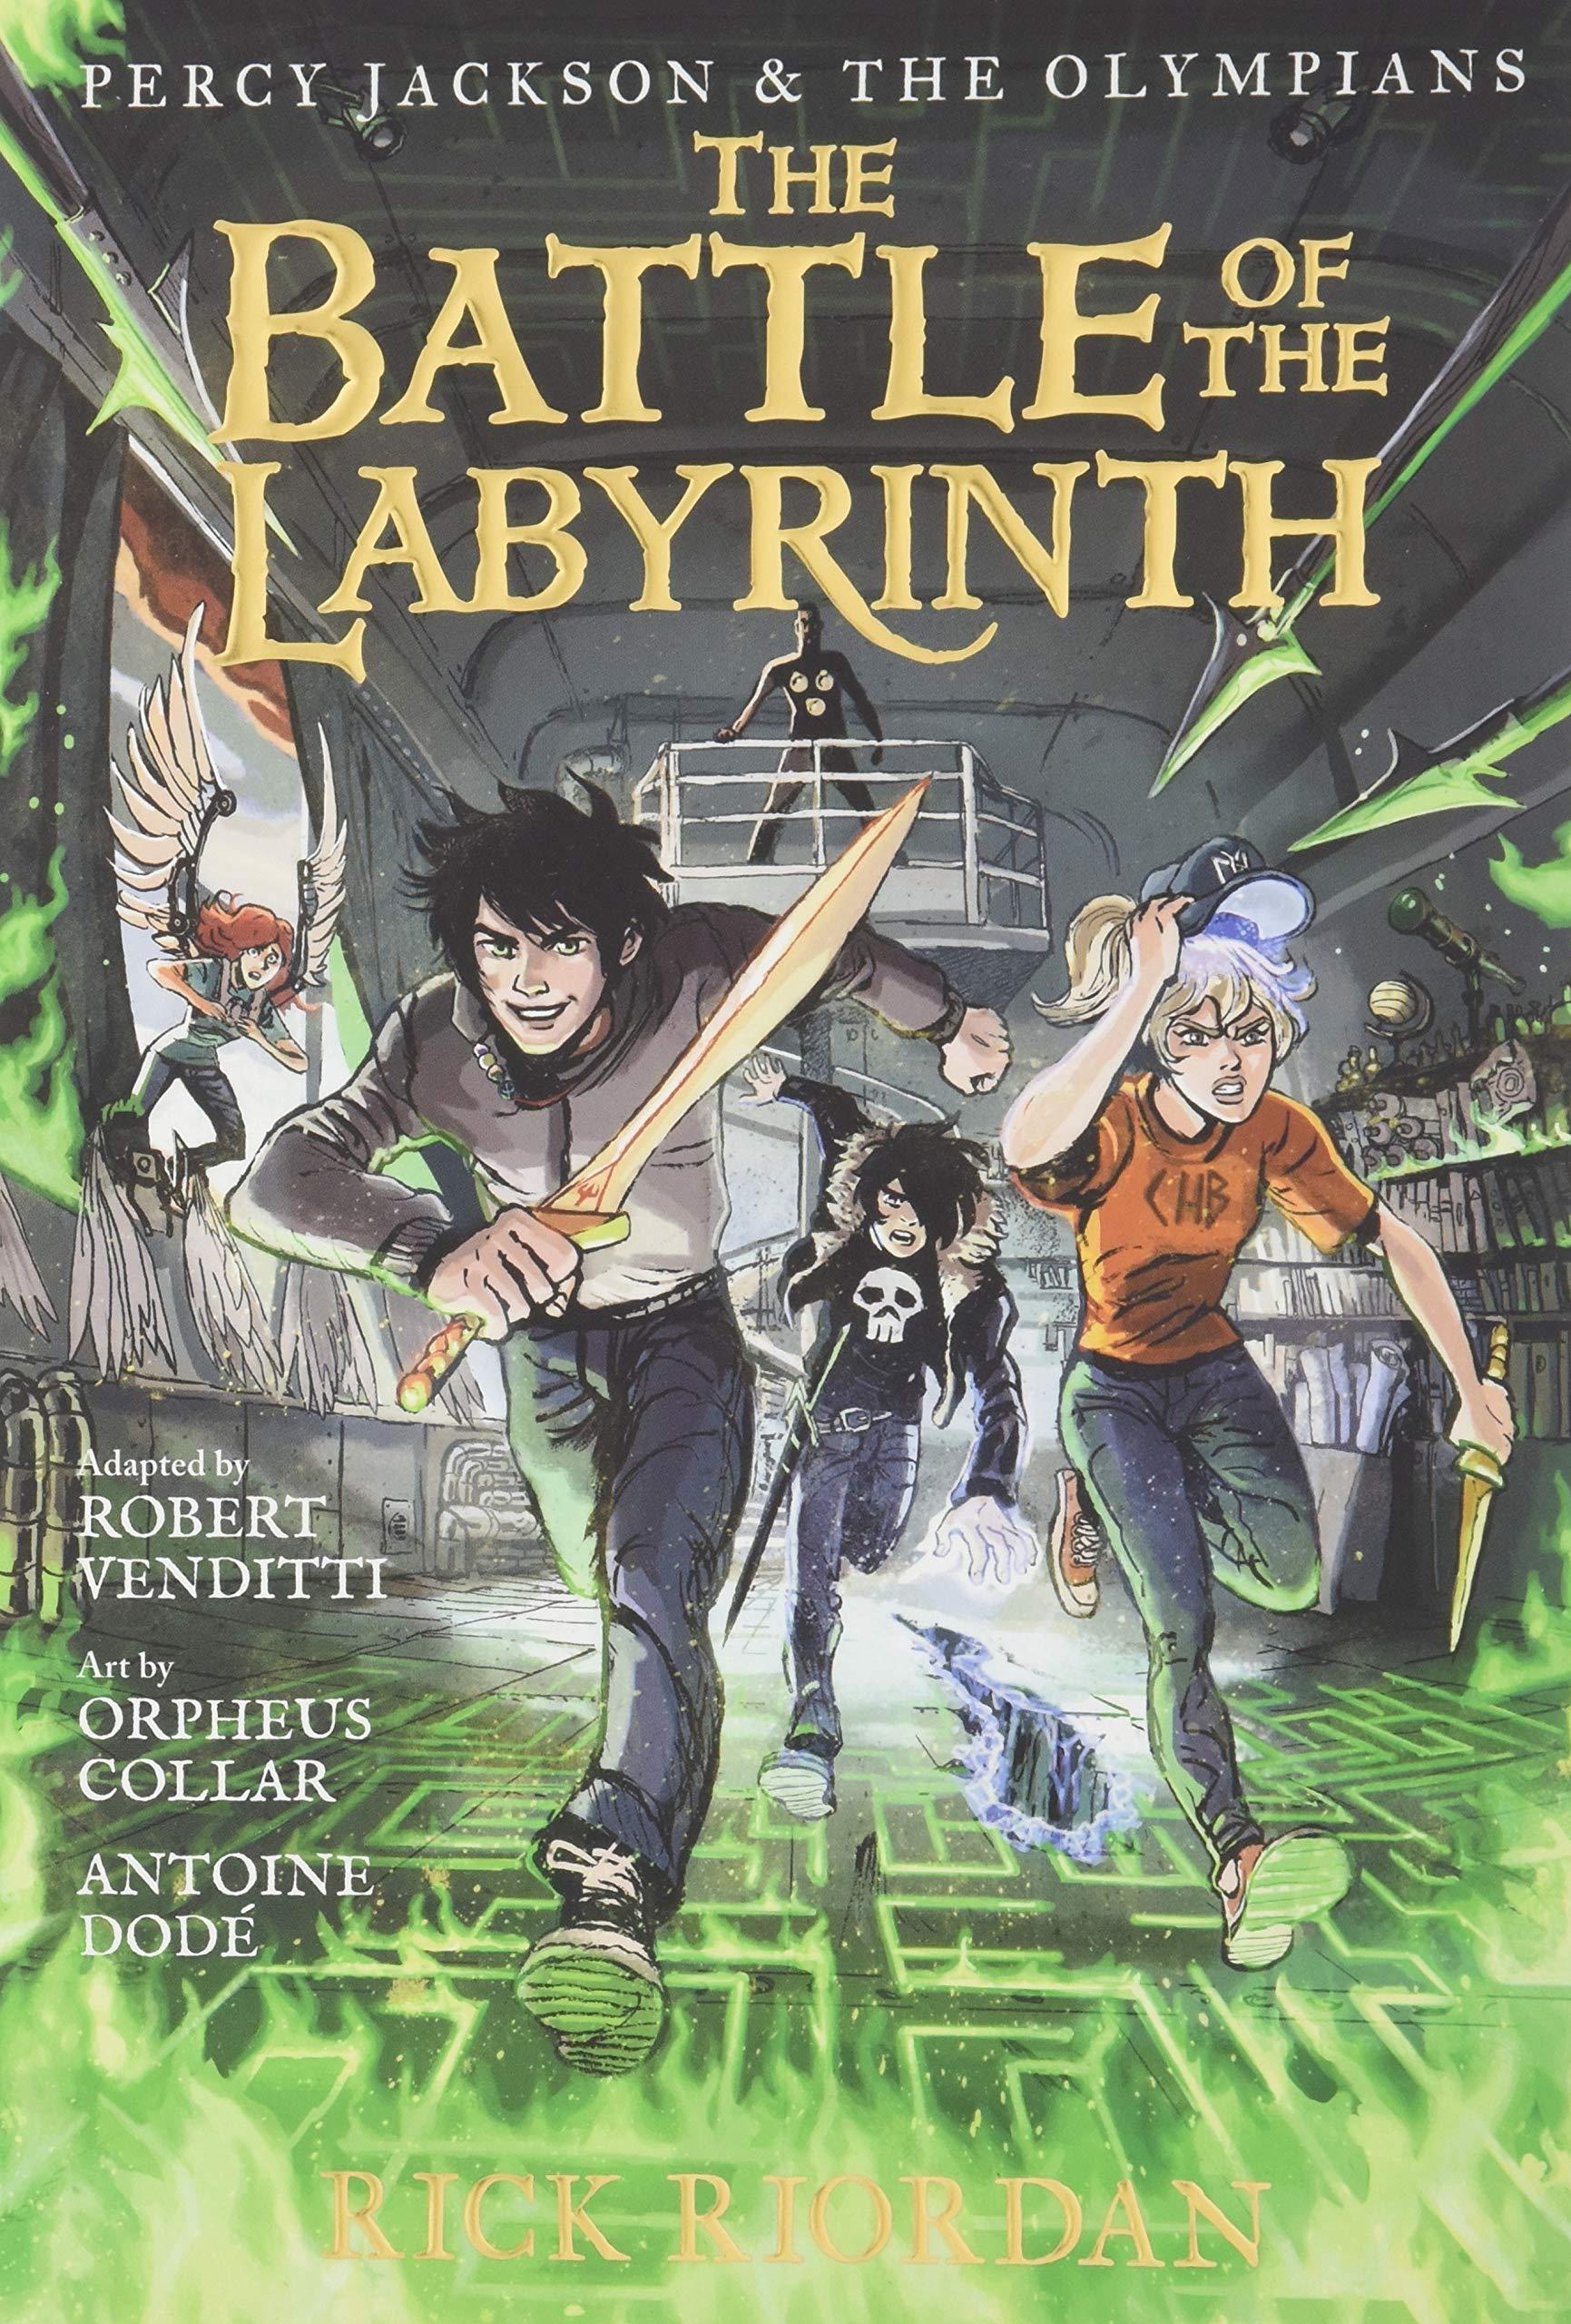 Percy Jackson and the Olympians the Battle of the Labyrinth: The Graphic Novel Percy Jackson and the Olympians : 4 Percy Jackson & the Olympians: Amazon.es: Riordan, Rick, Venditti, Robert, Collar, Orpheus: